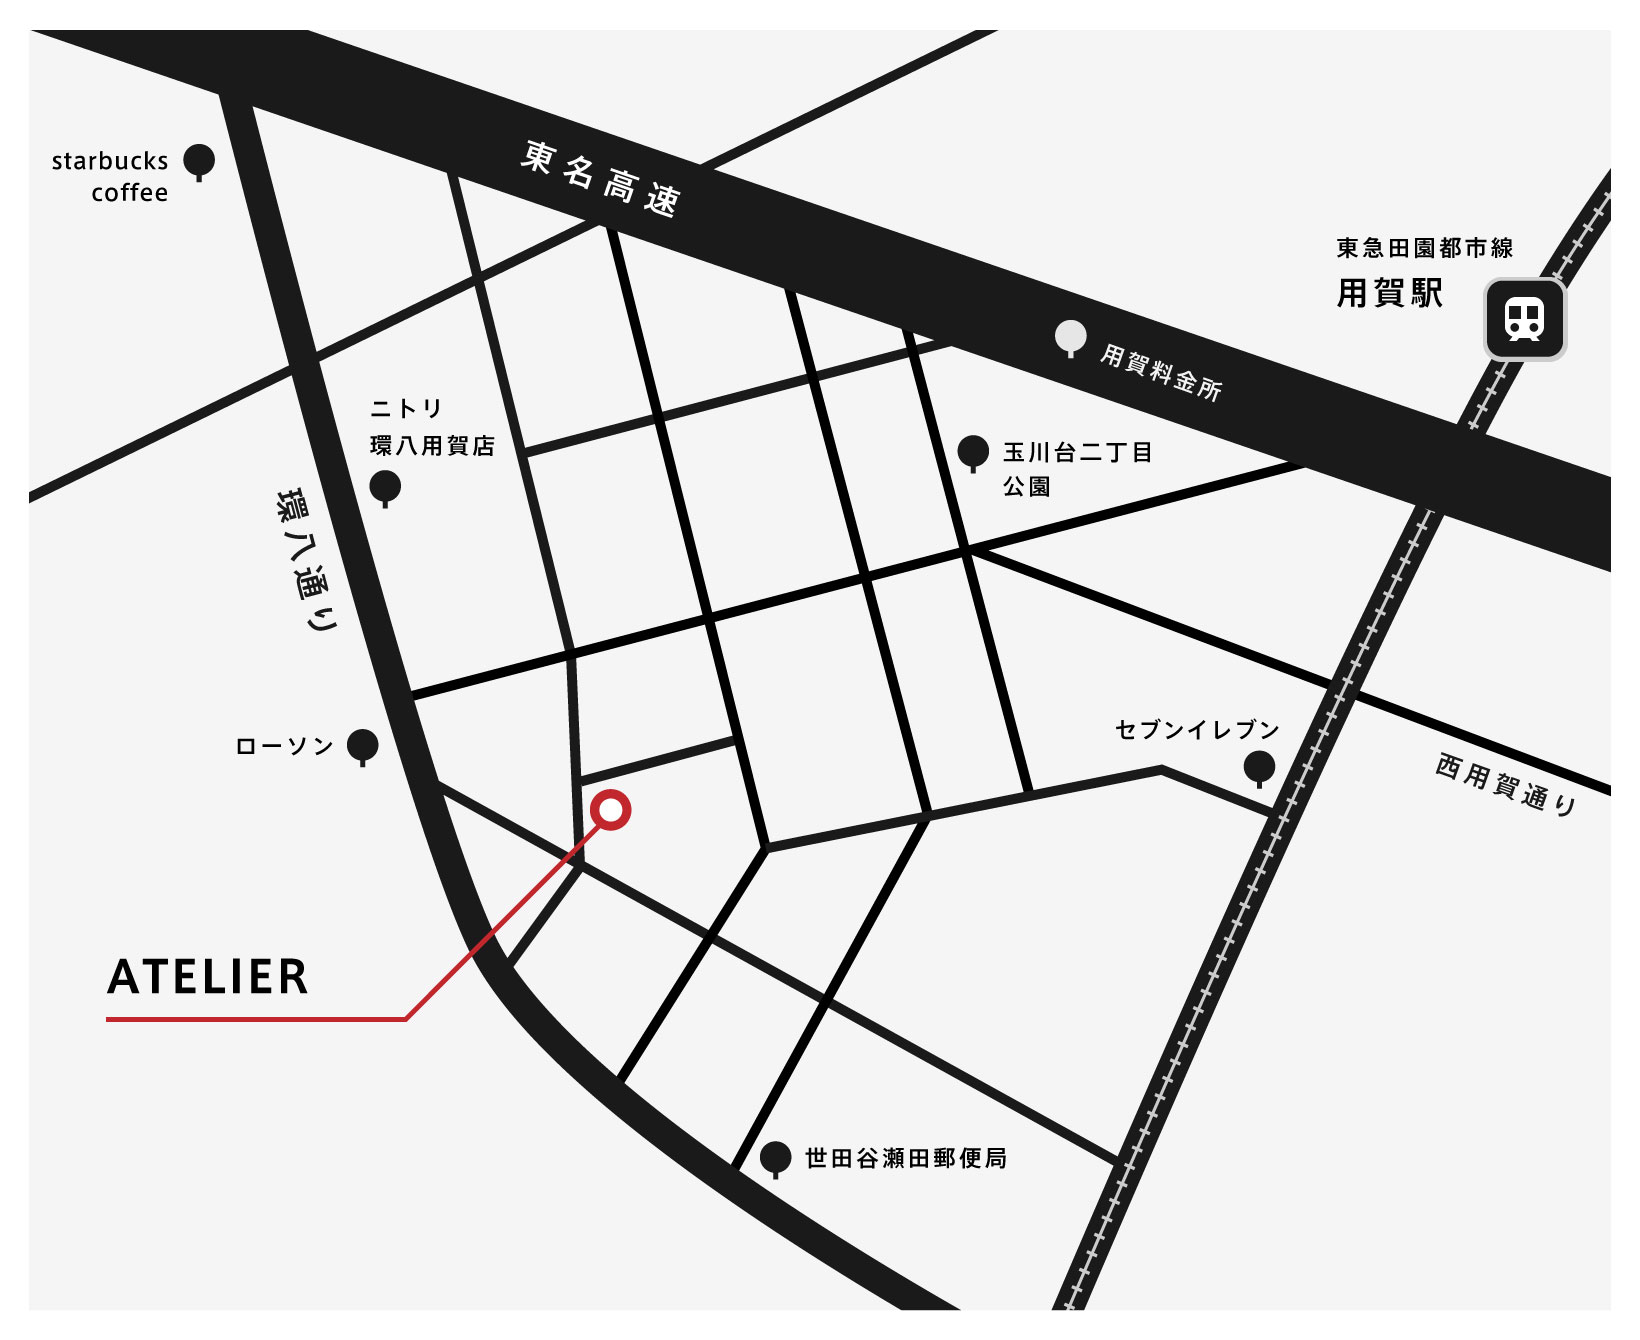 Noriaki Fukushima Atelier